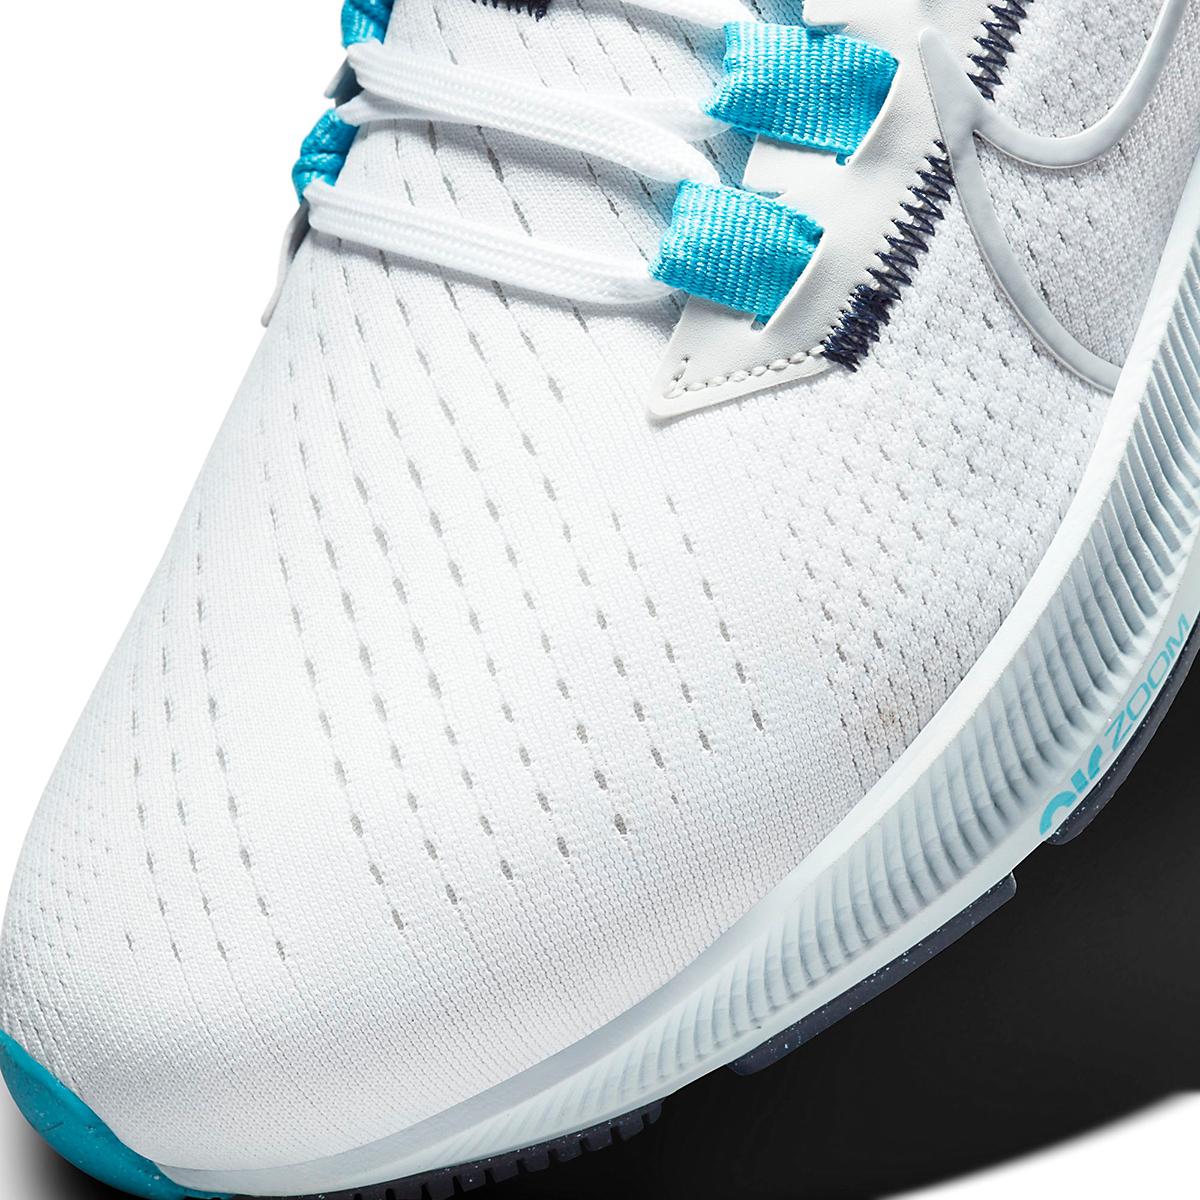 Men's Nike Air Zoom Pegasus 38 Running Shoe - Color: White/Wolf Grey/Pure Platinum - Size: 6 - Width: Regular, White/Wolf Grey/Pure Platinum, large, image 4